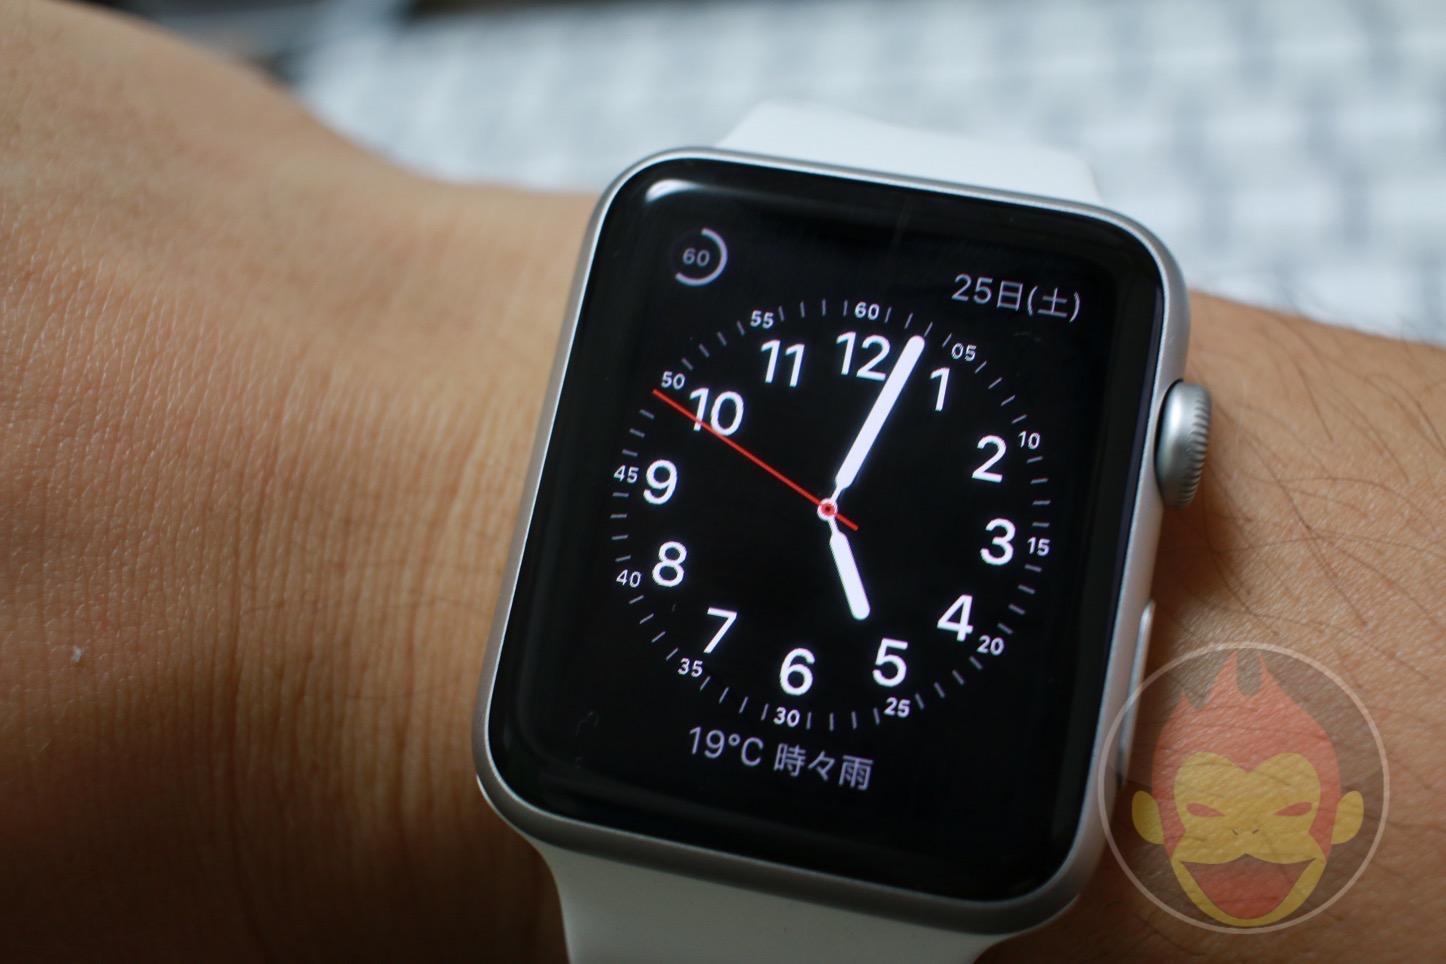 Apple-Watch-Battery-Usage-13.JPG